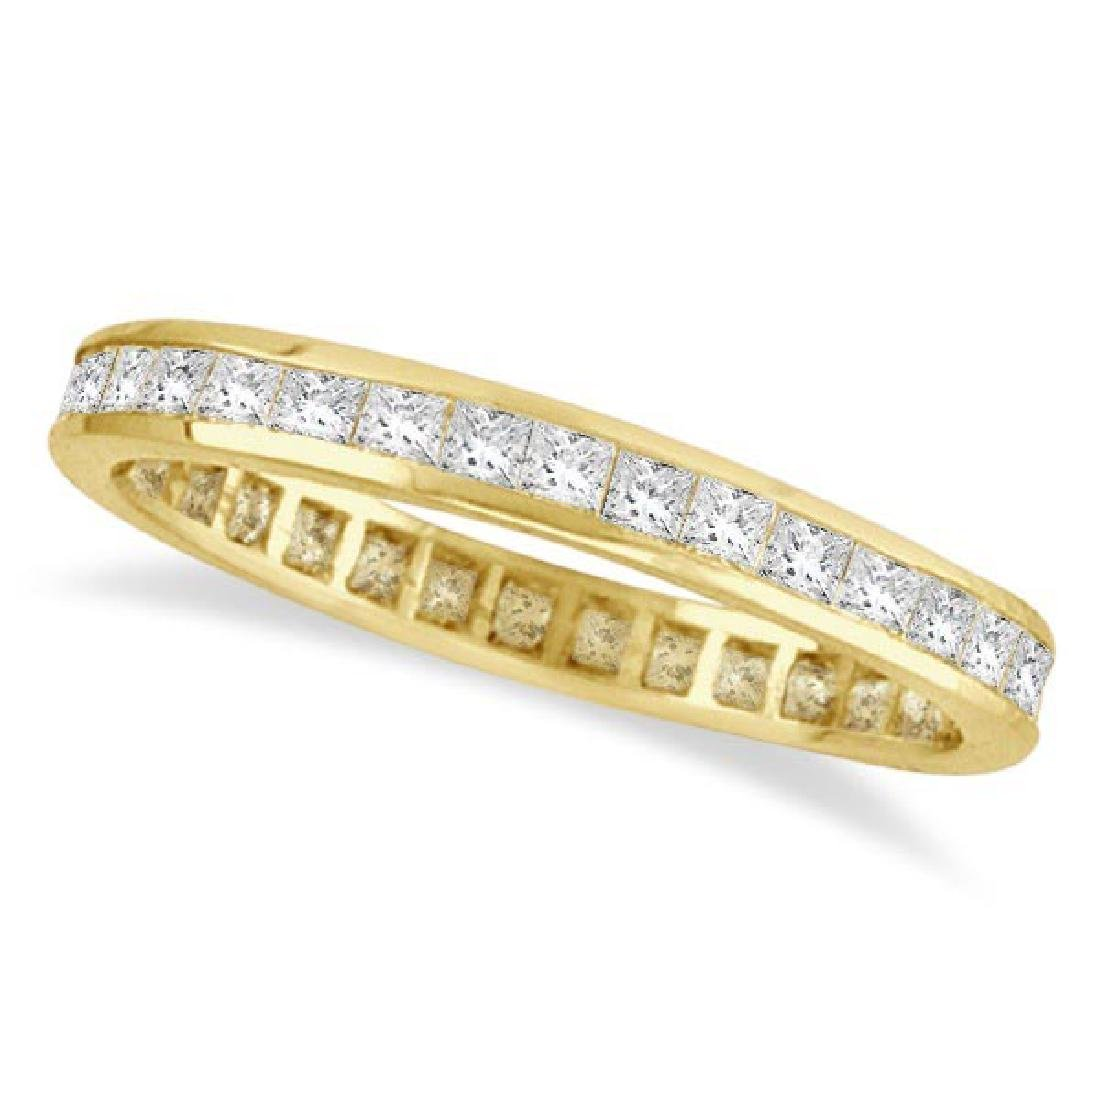 Princess-Cut Diamond Eternity Ring Band 14k Yellow Gold